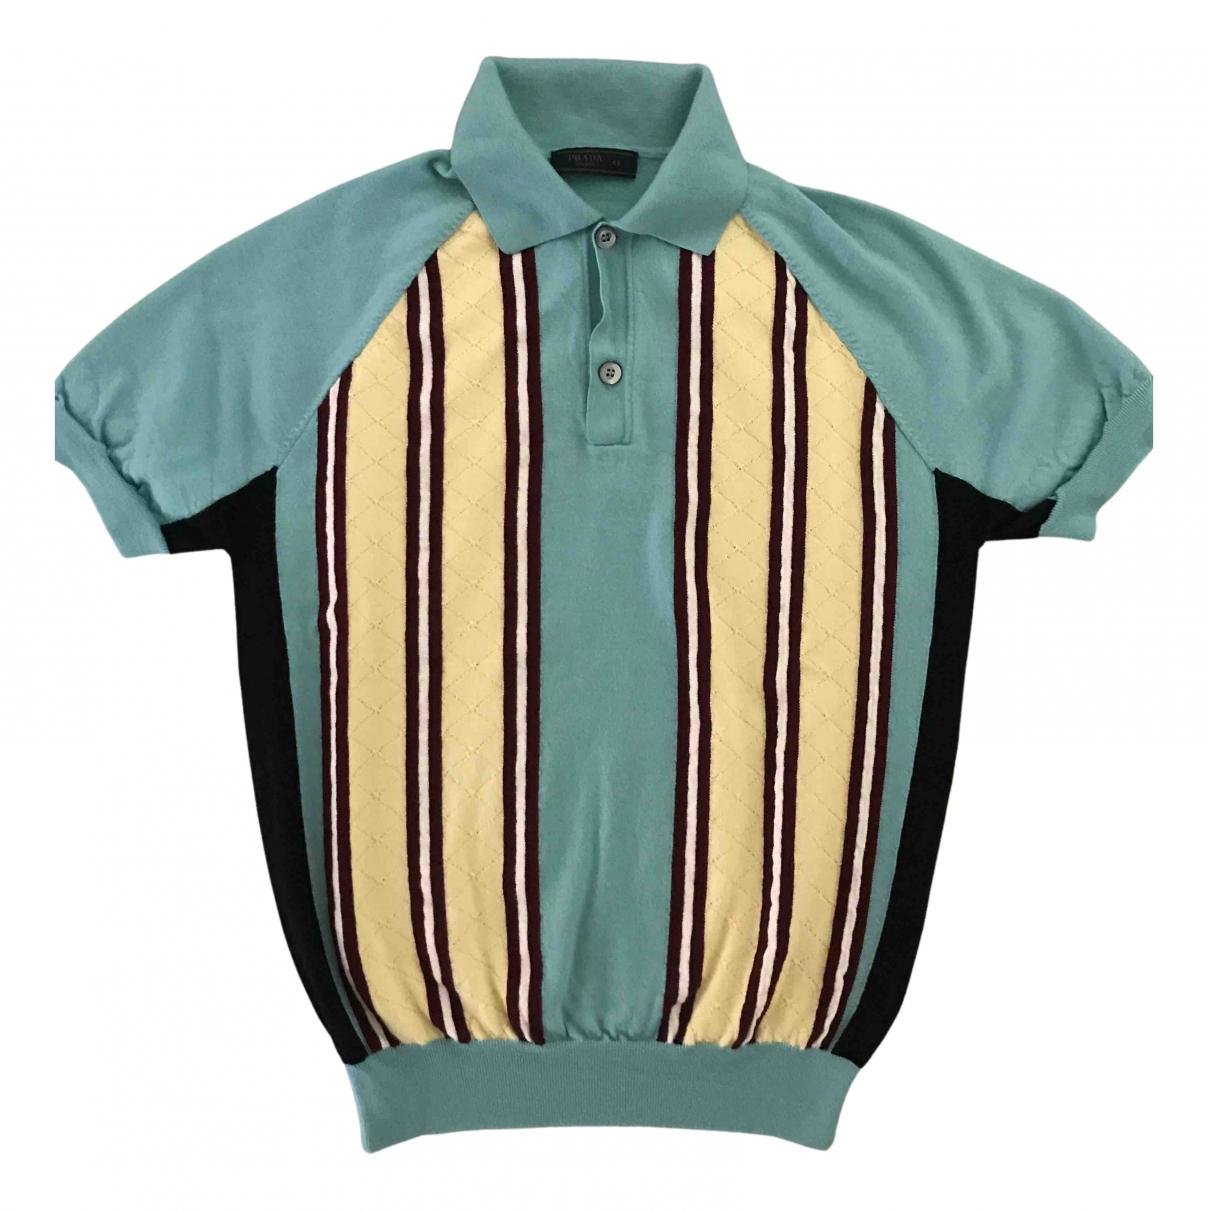 Prada N Turquoise Polo shirts for Men 48 IT